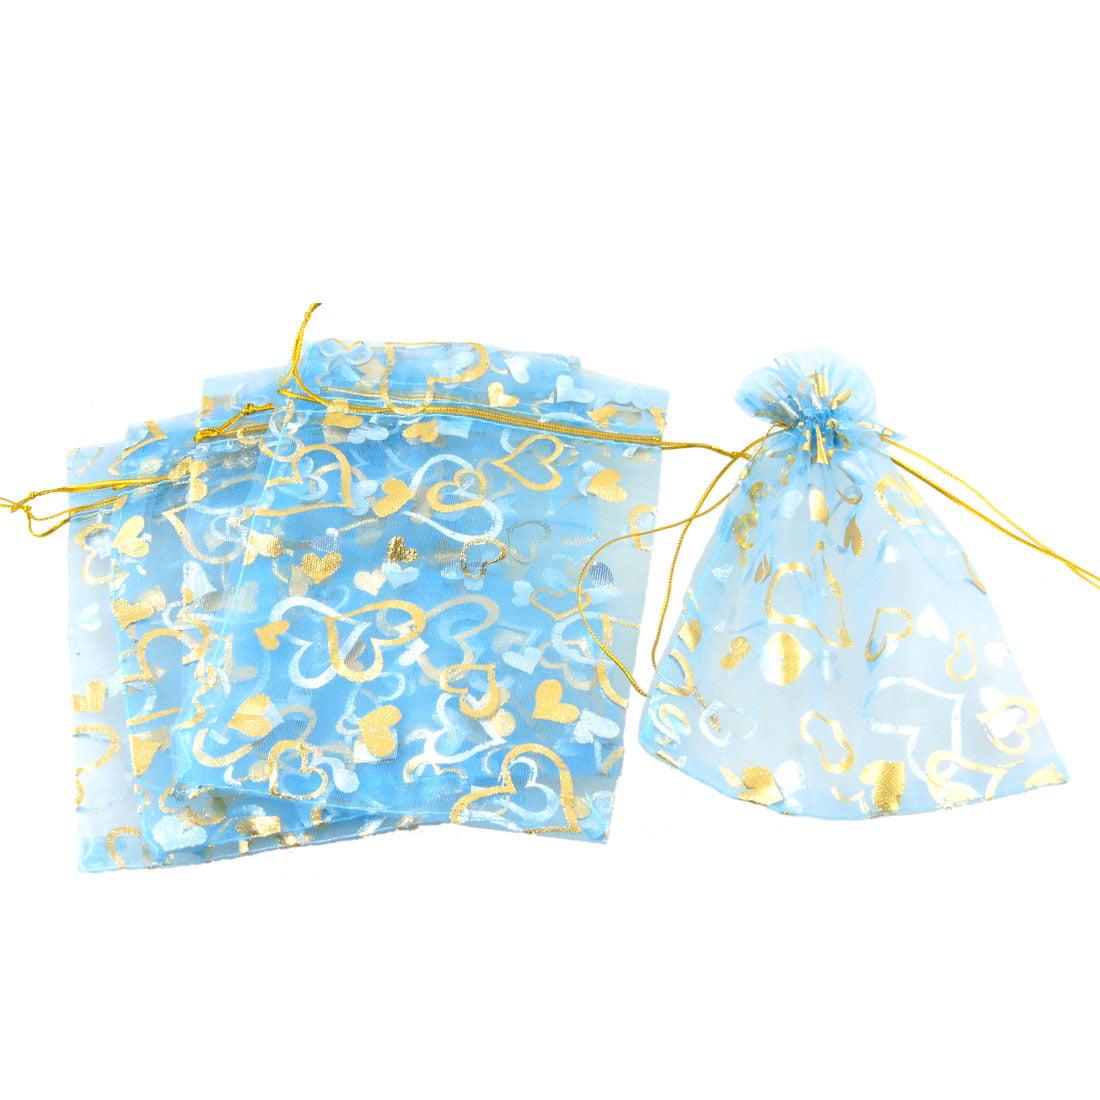 5 Pcs Gold Tone Heart Prints Sky Blue Organza Favor Gift Pouch Sachet Bags